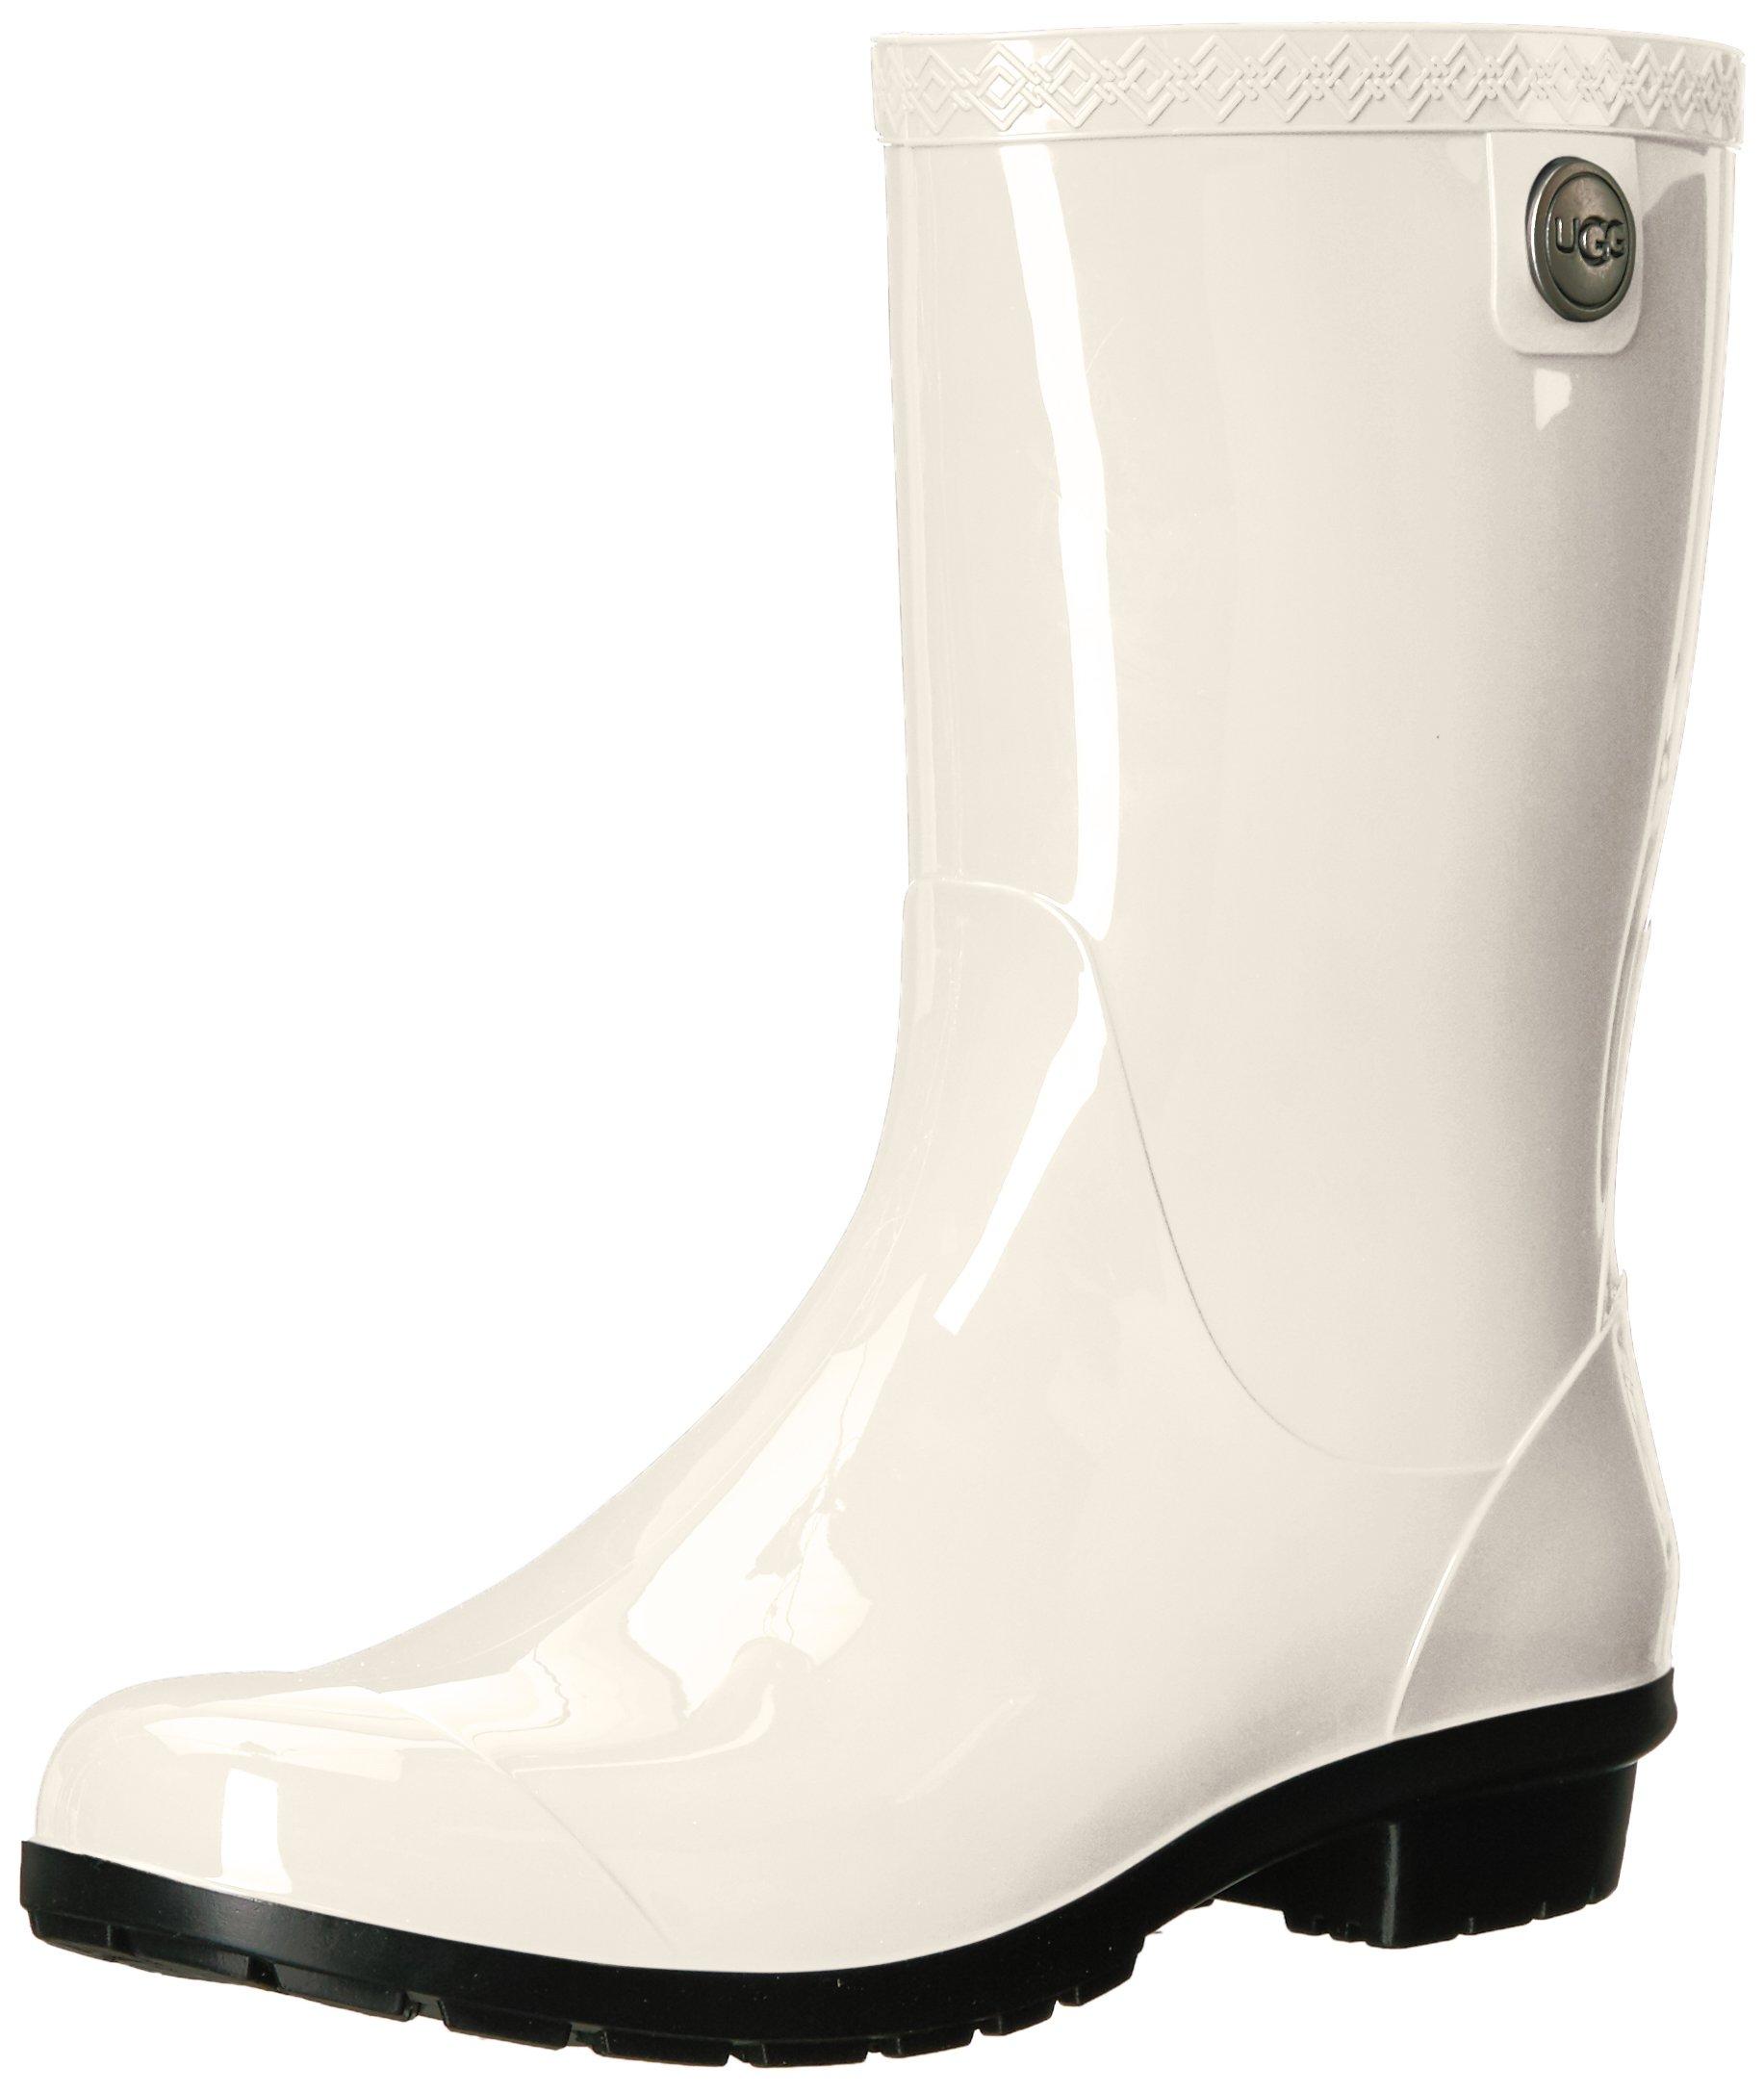 UGG Women's Sienna Rain Shoe, White/Black, 7 M US